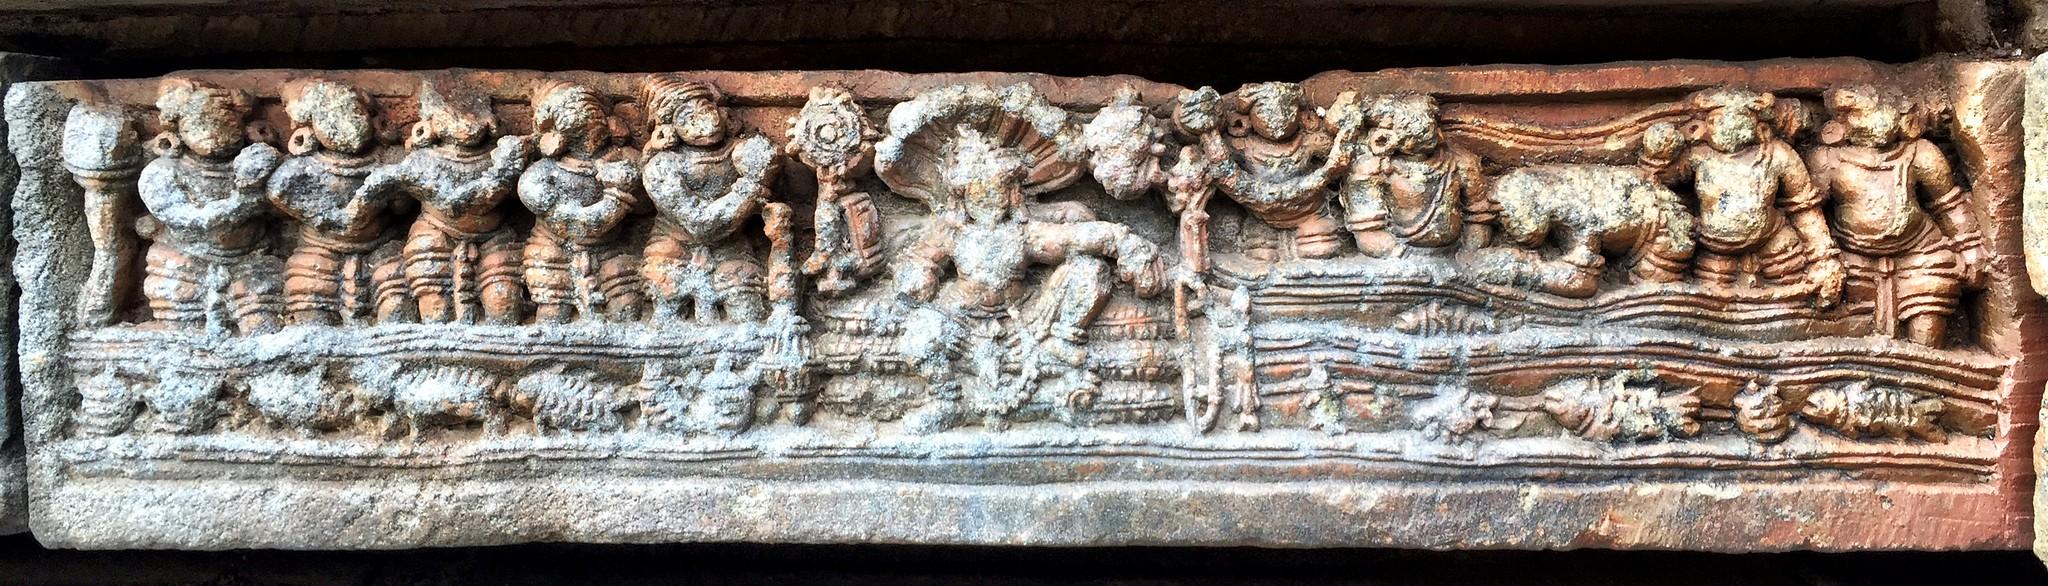 Vishnu chilling in Vaikuntha